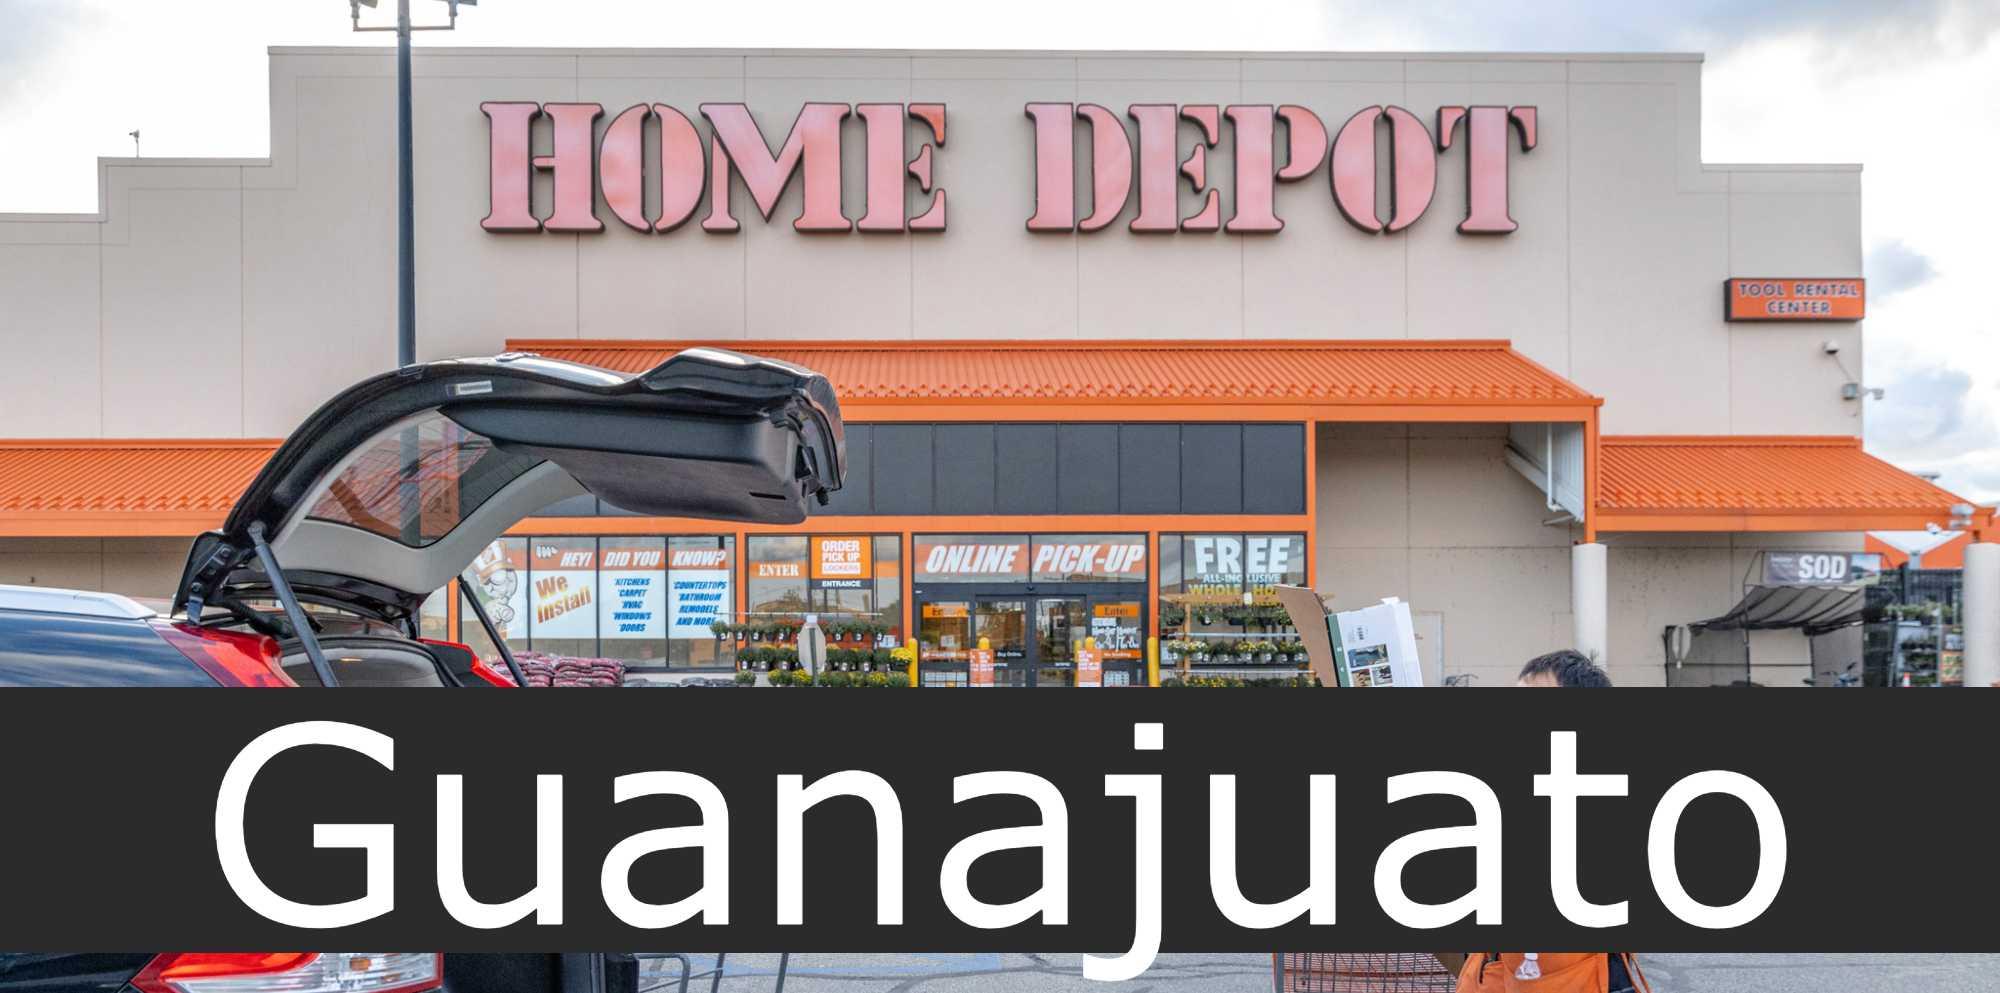 home depot Guanajuato